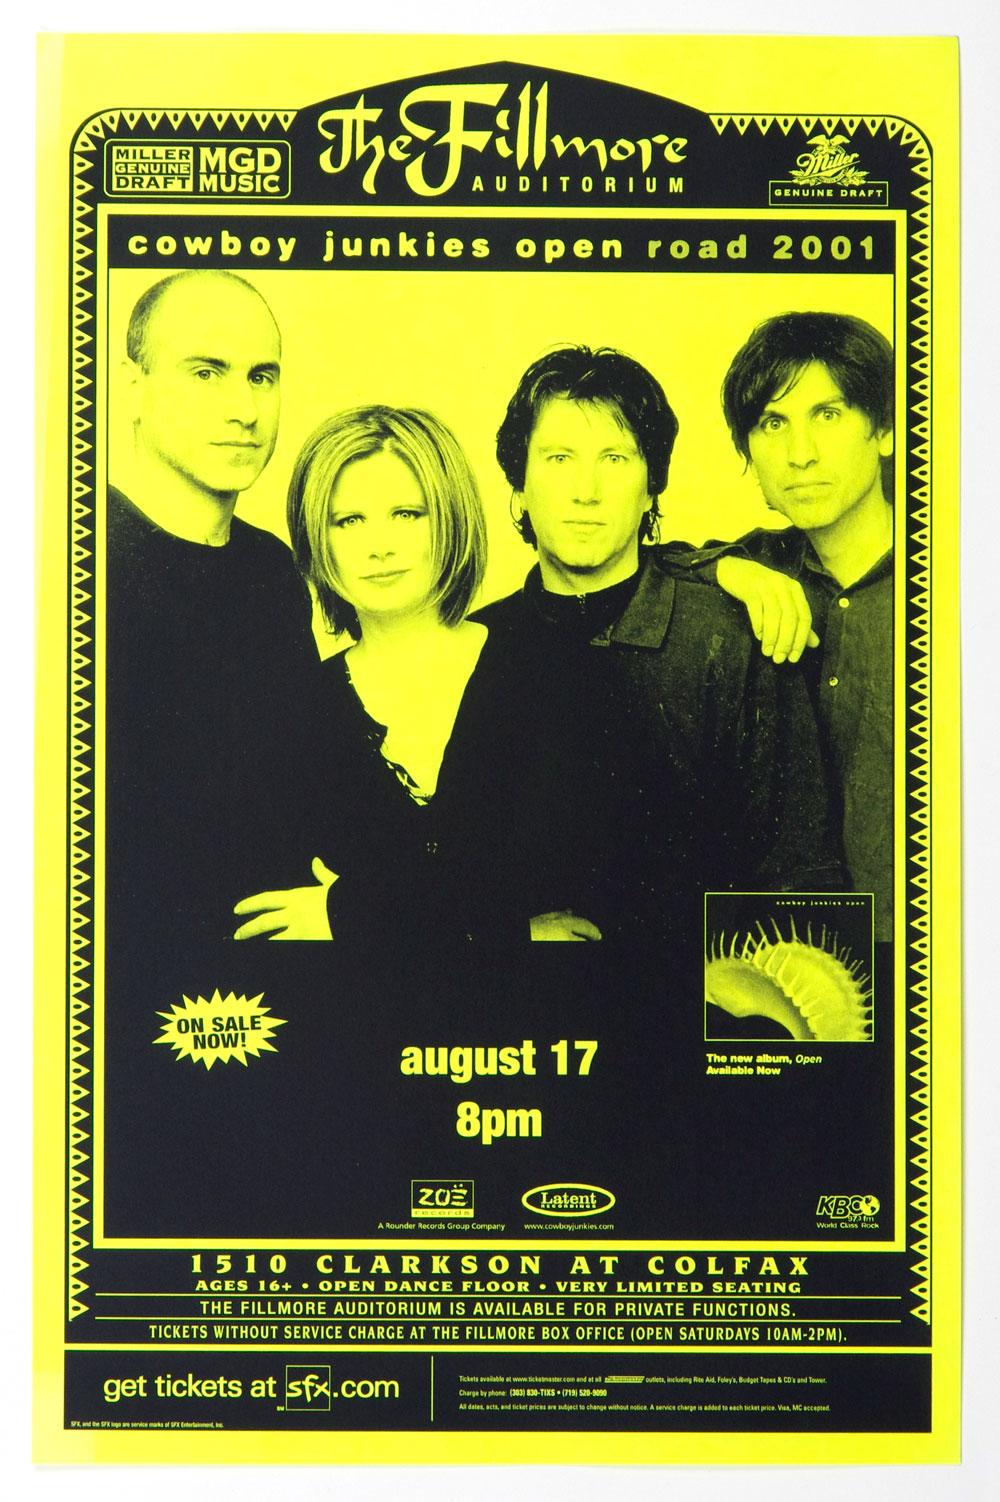 Cowboy Junkies Poster 2001 Aug 17 The Fillmore Denver